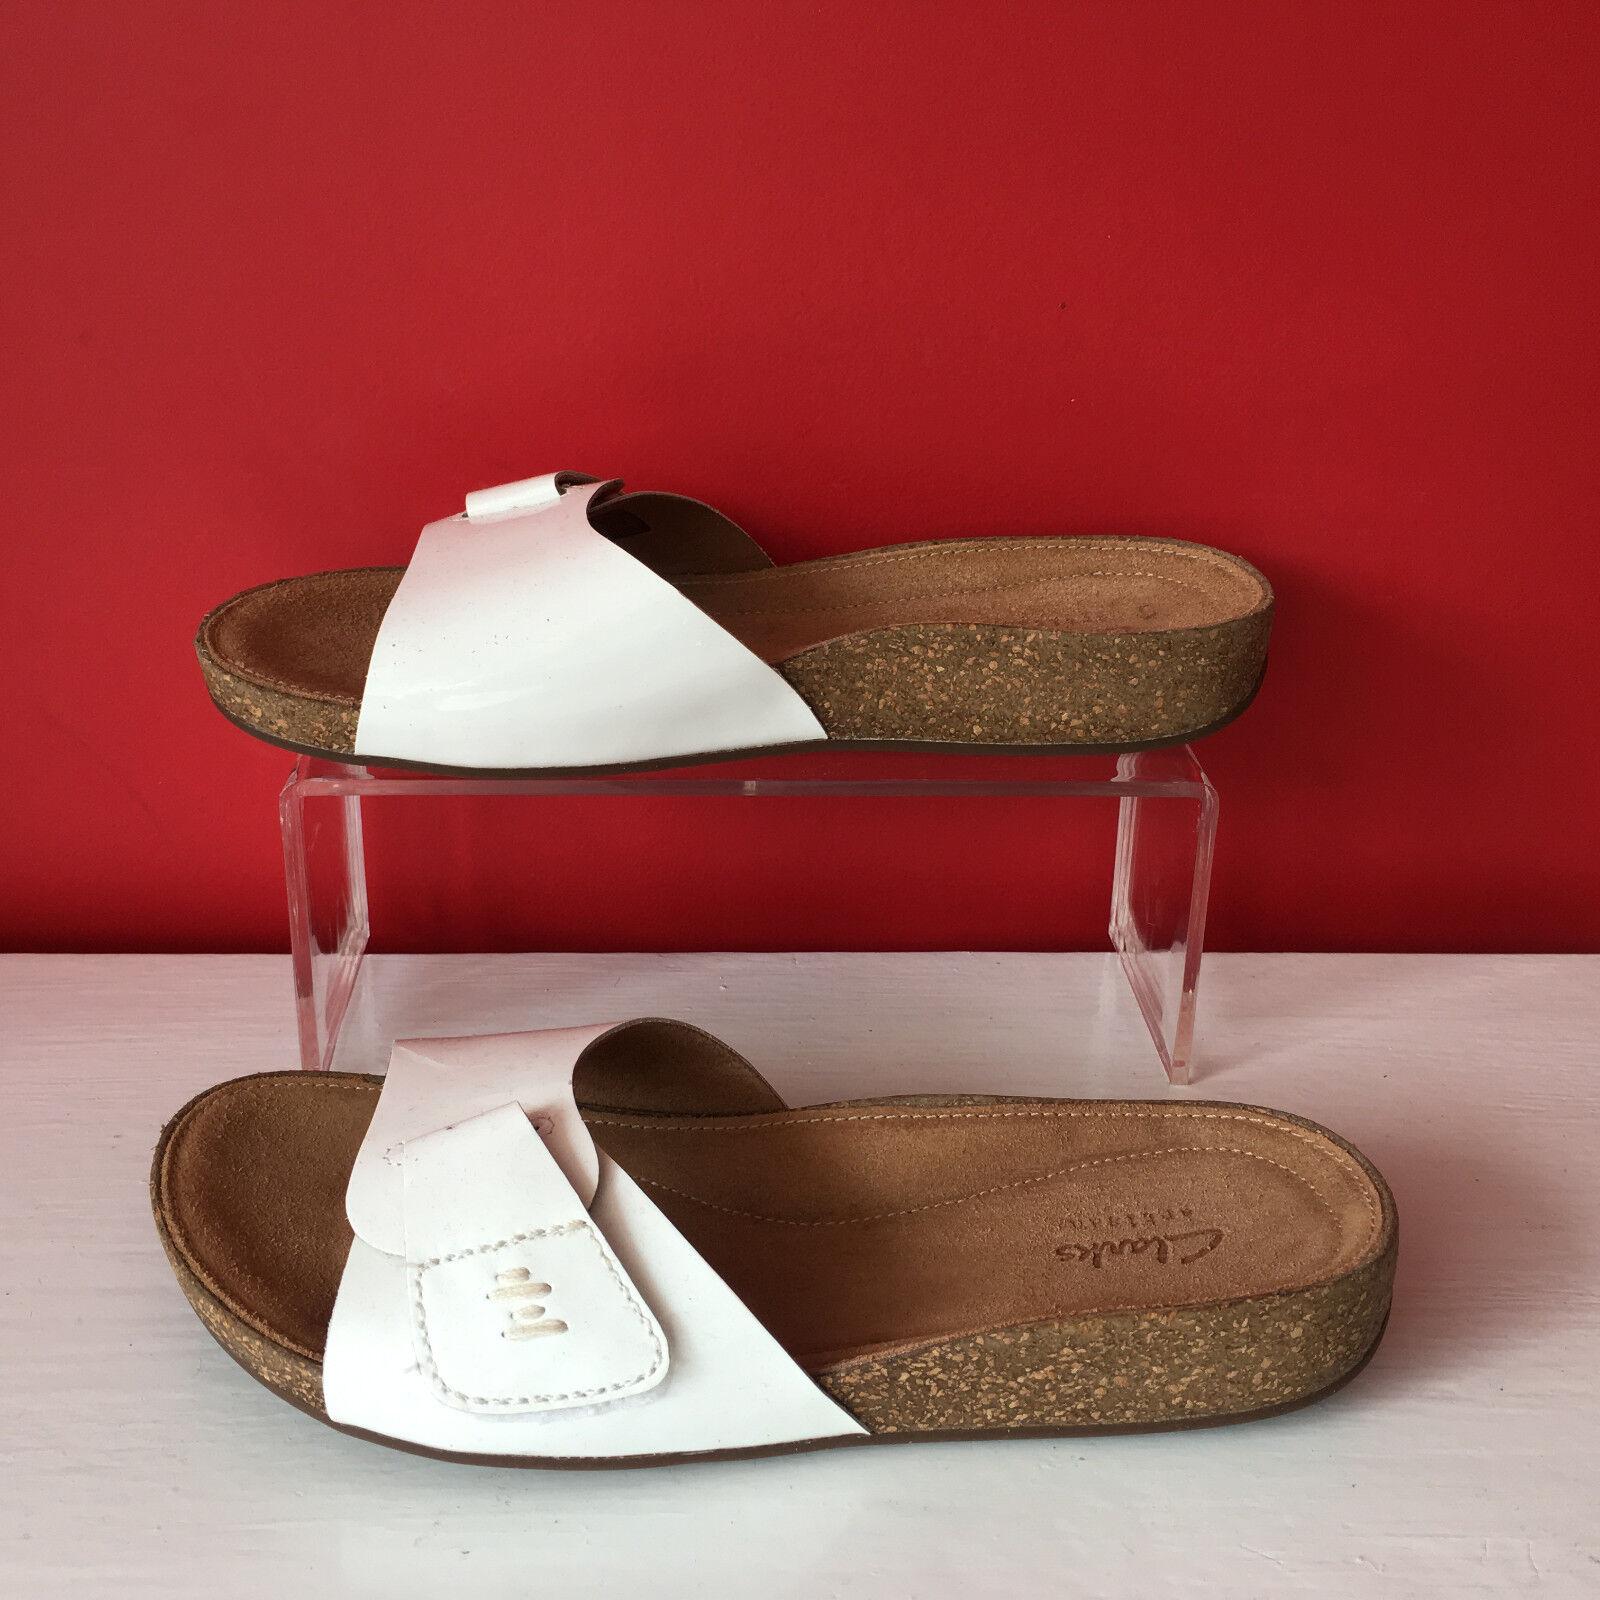 Clarks White Patent Leather Flat Slip On Mules Sandals Flip Flops UK 4.5 EU 37.5